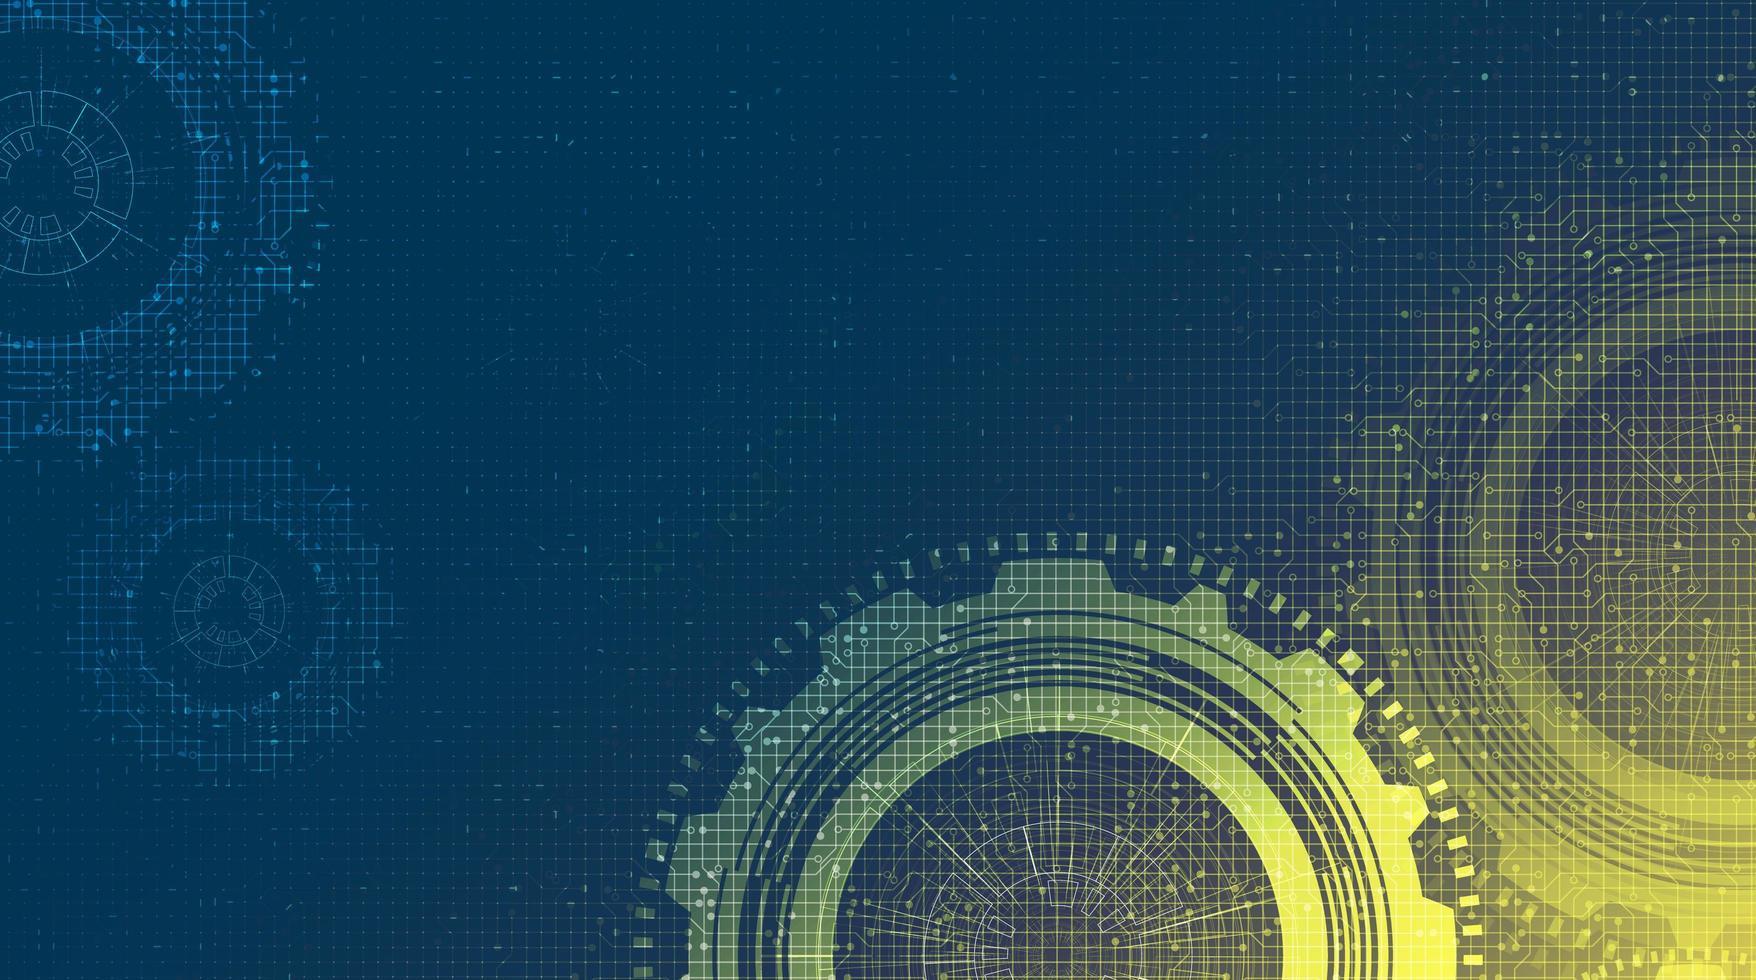 Cyber Technology Gears hjul och kugge med Circuit Line bakgrund. vektor